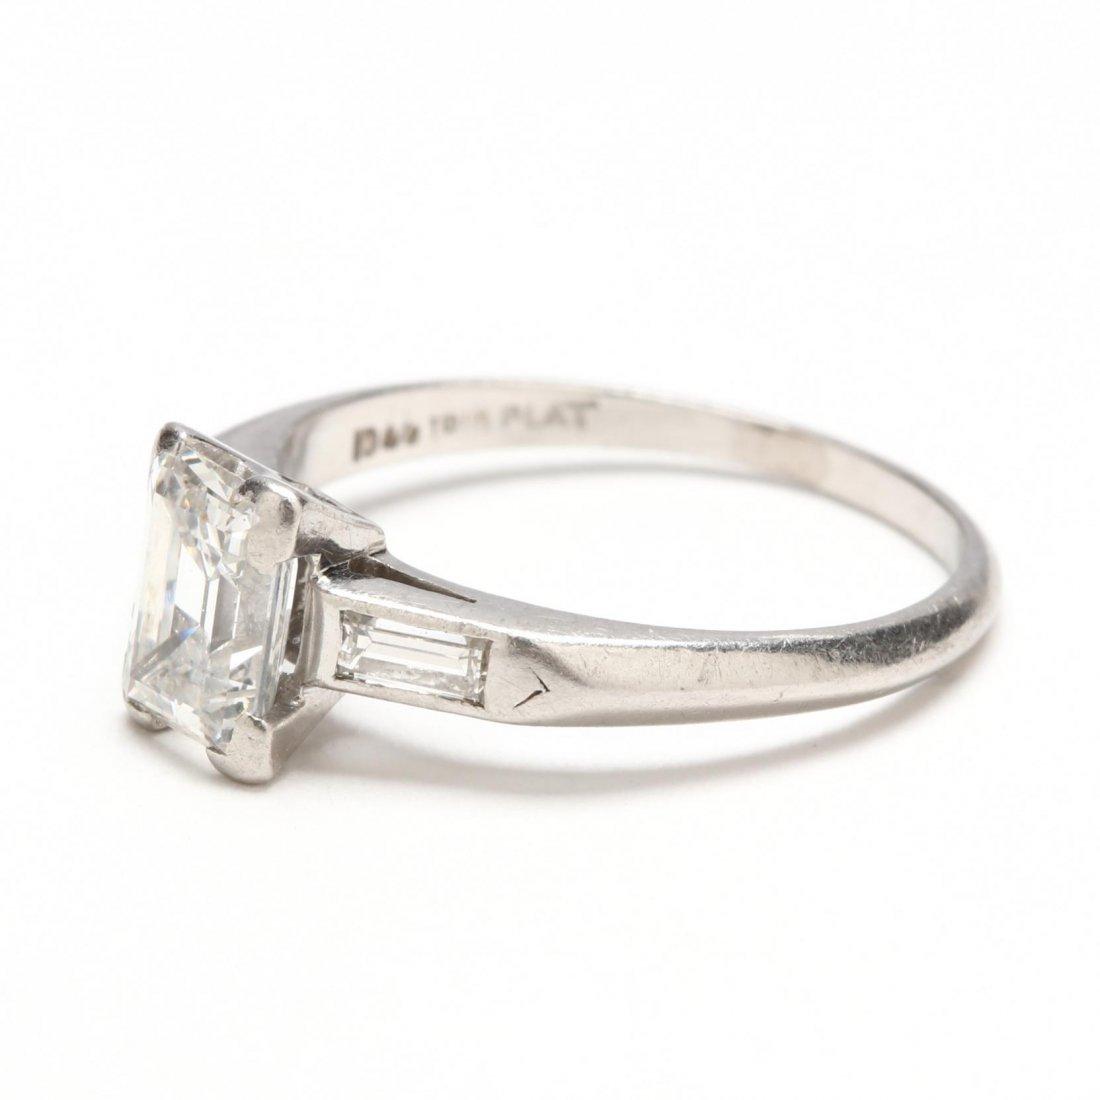 Platinum and Diamond Ring - 4